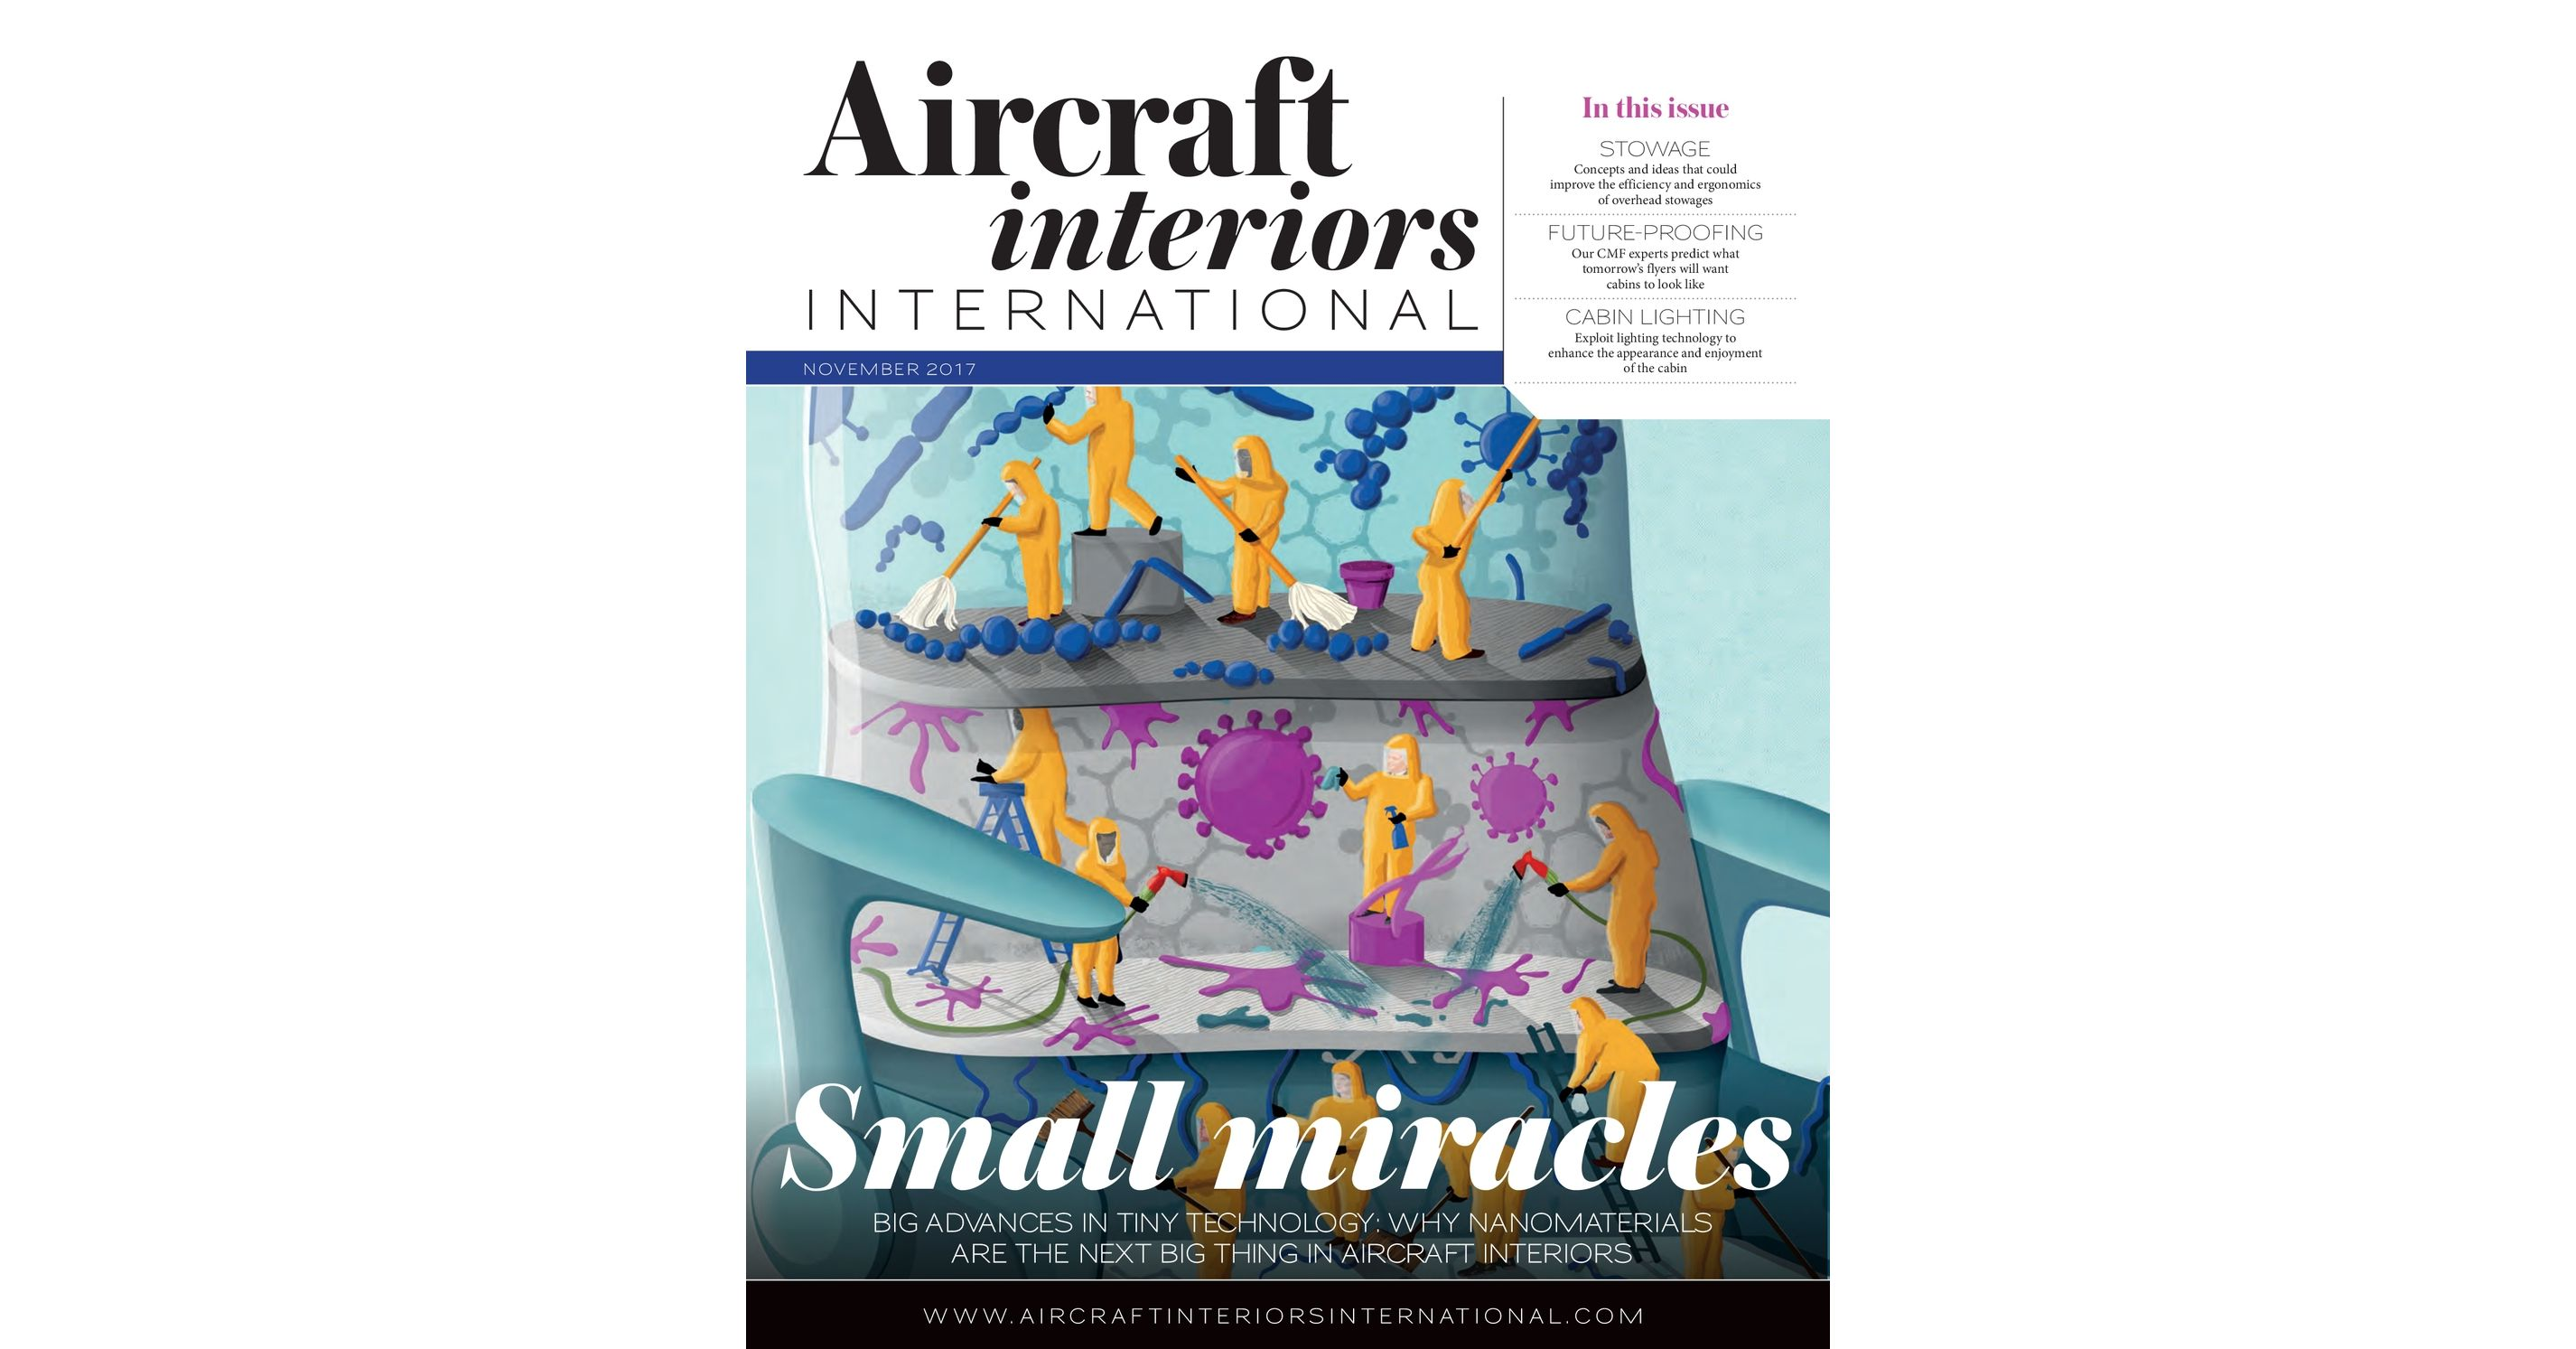 Aircraft Interiors International - November 2017